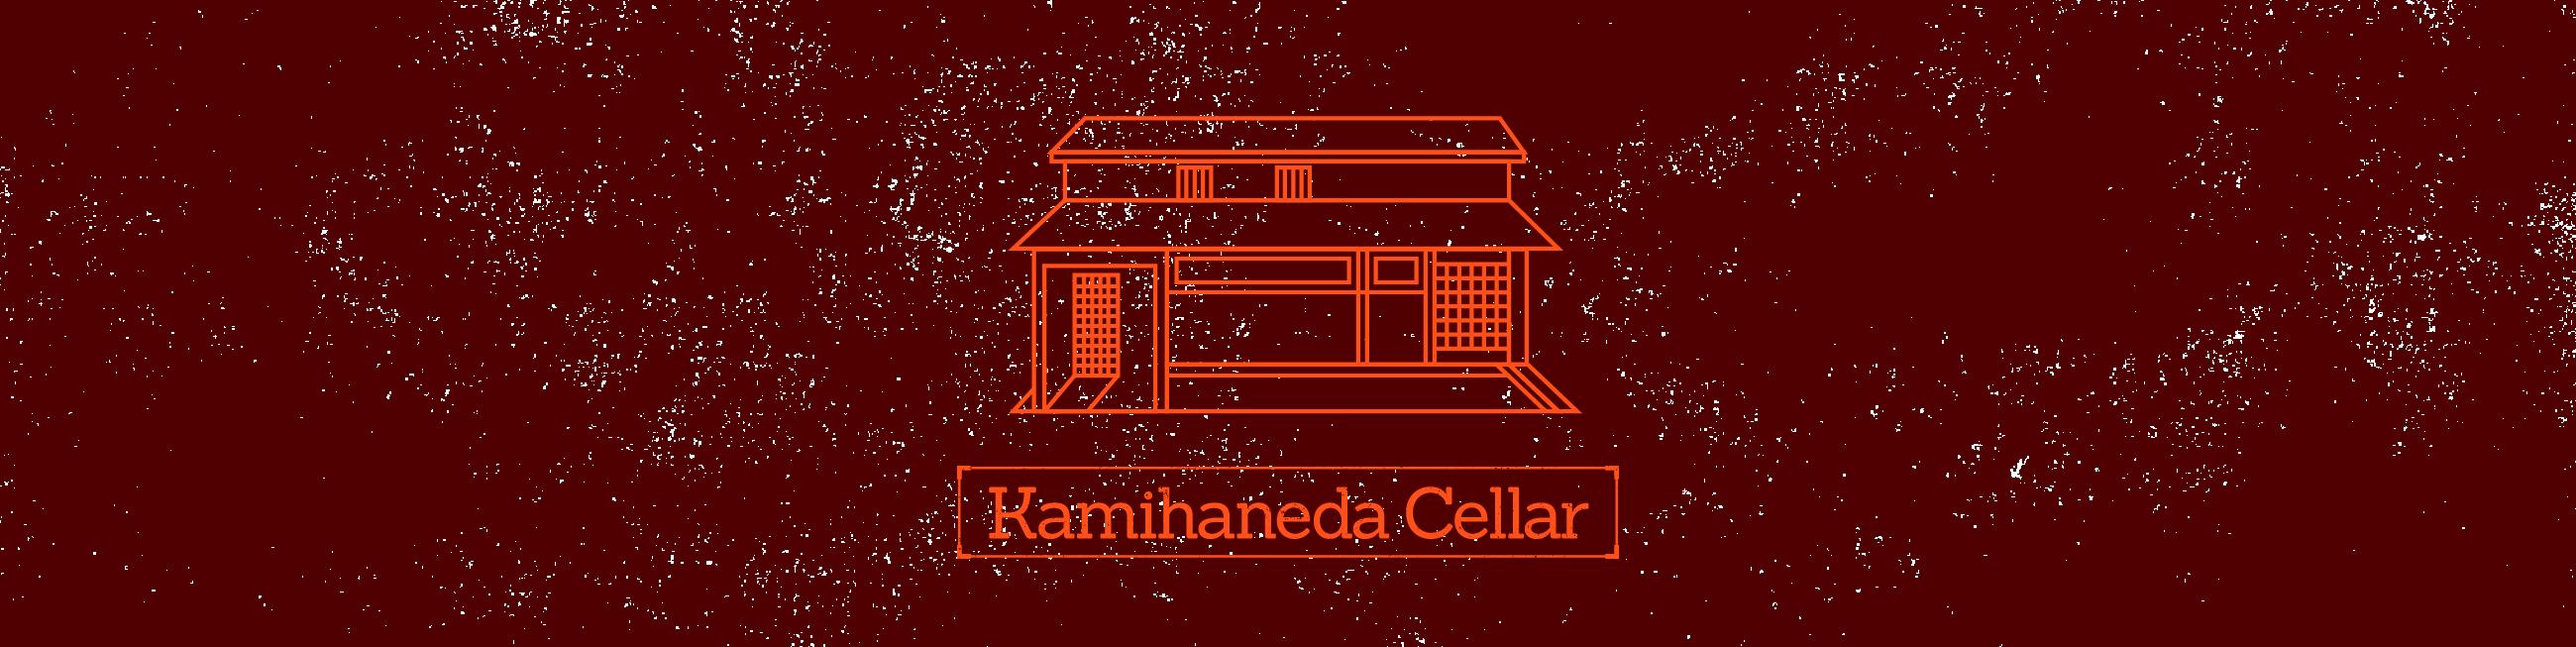 Kamihaneda Cellar